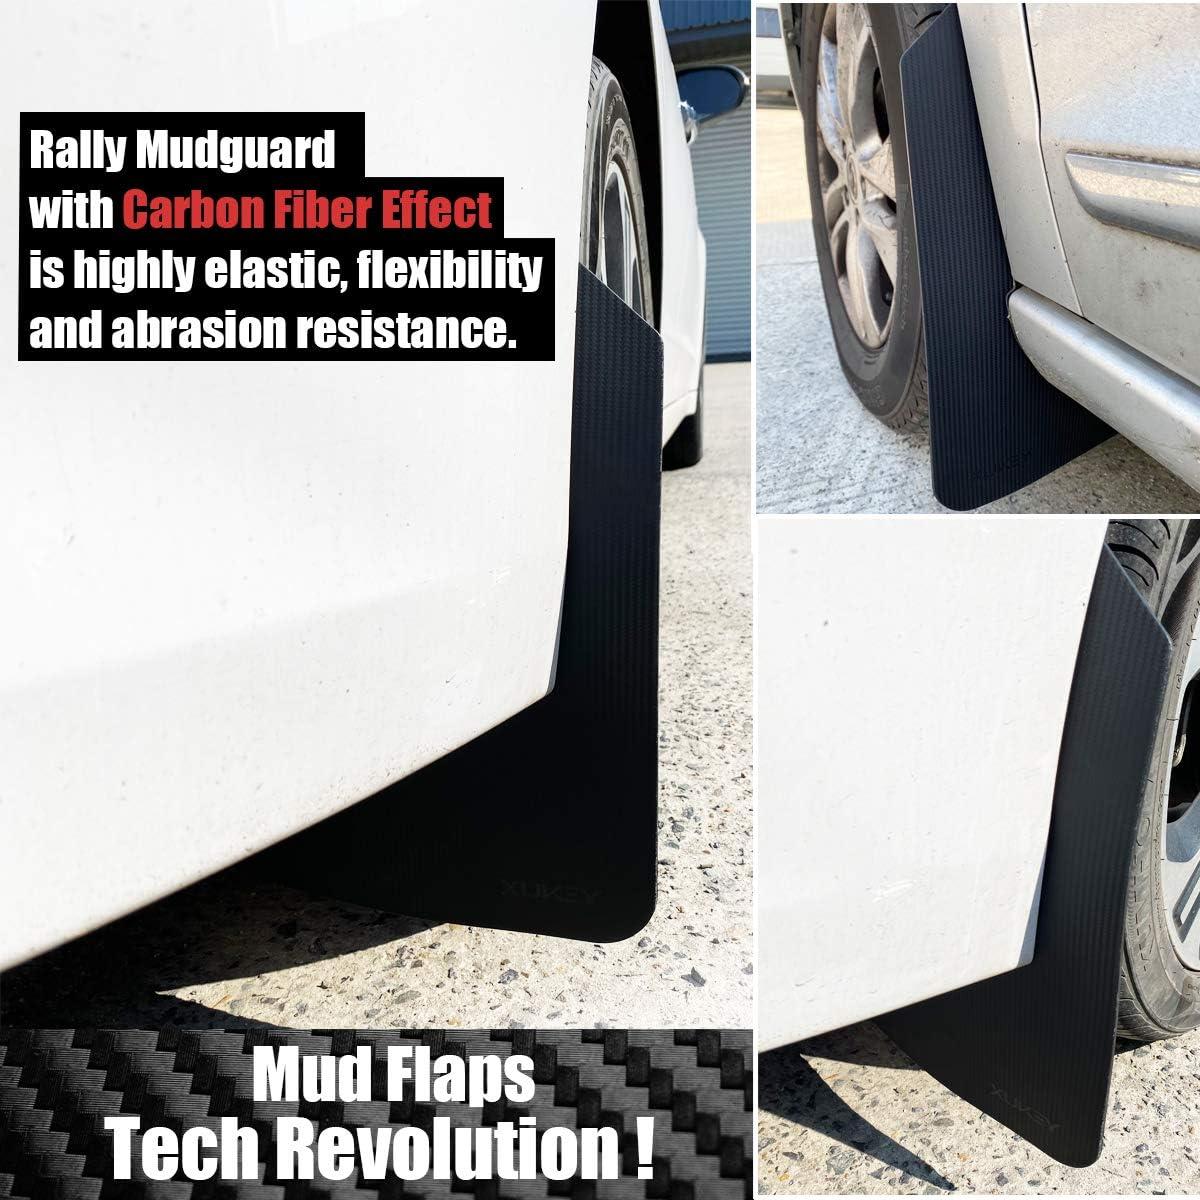 XUKEY 2pcs//Set Universal Carbon Fiber Effect Mudflaps for Car Pickup SUV Van Truck Mud Flaps Splash Guards Mudguards Dirty Traps